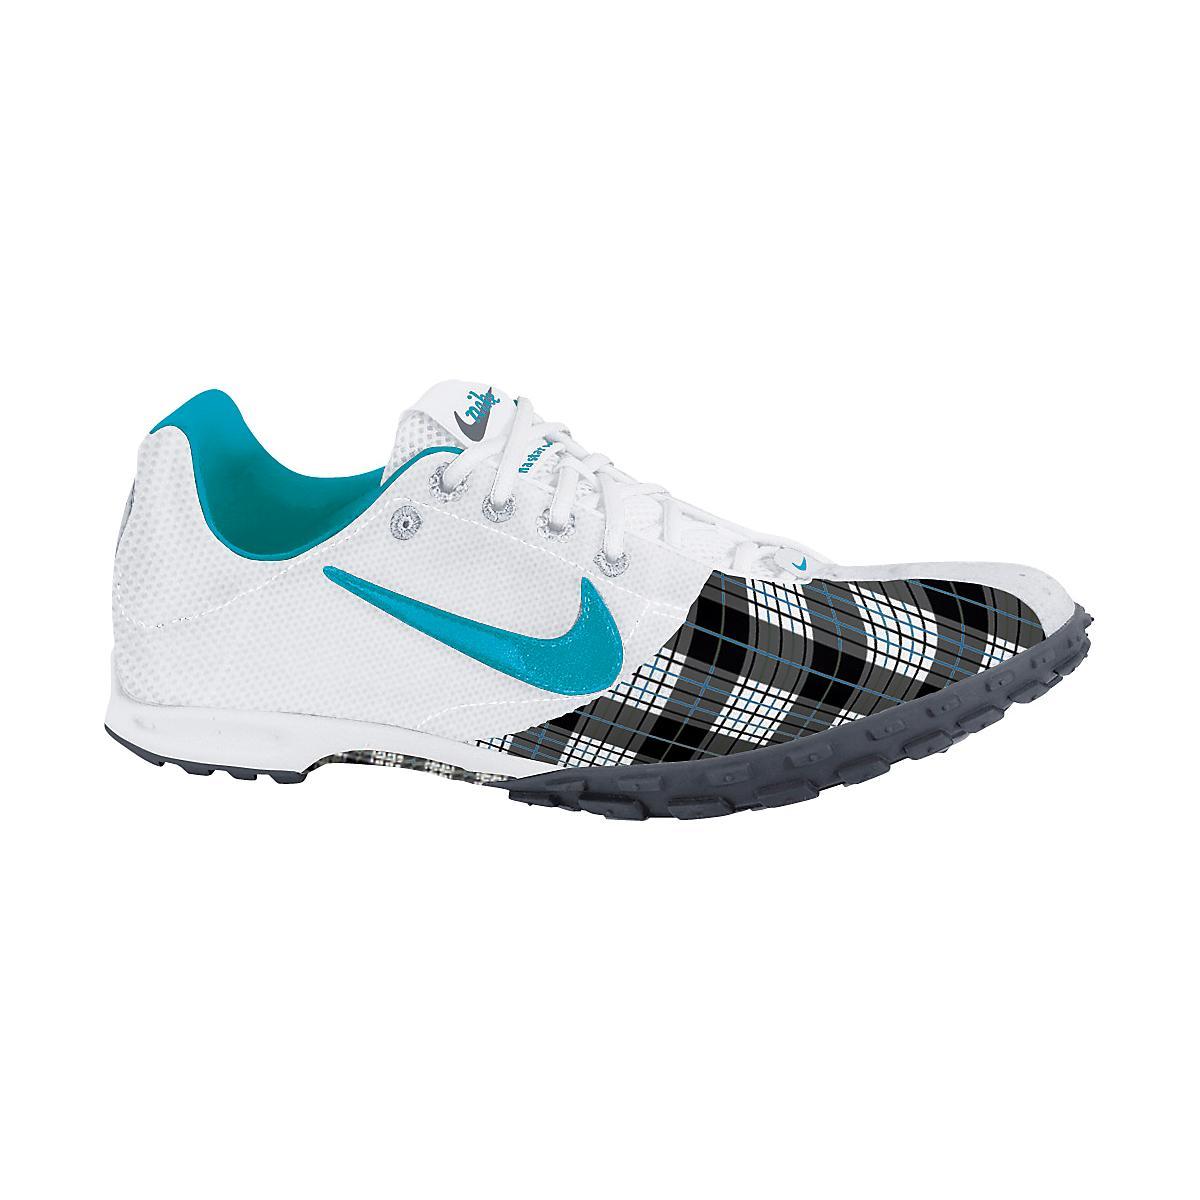 Nike Cross Country Racing Shoes